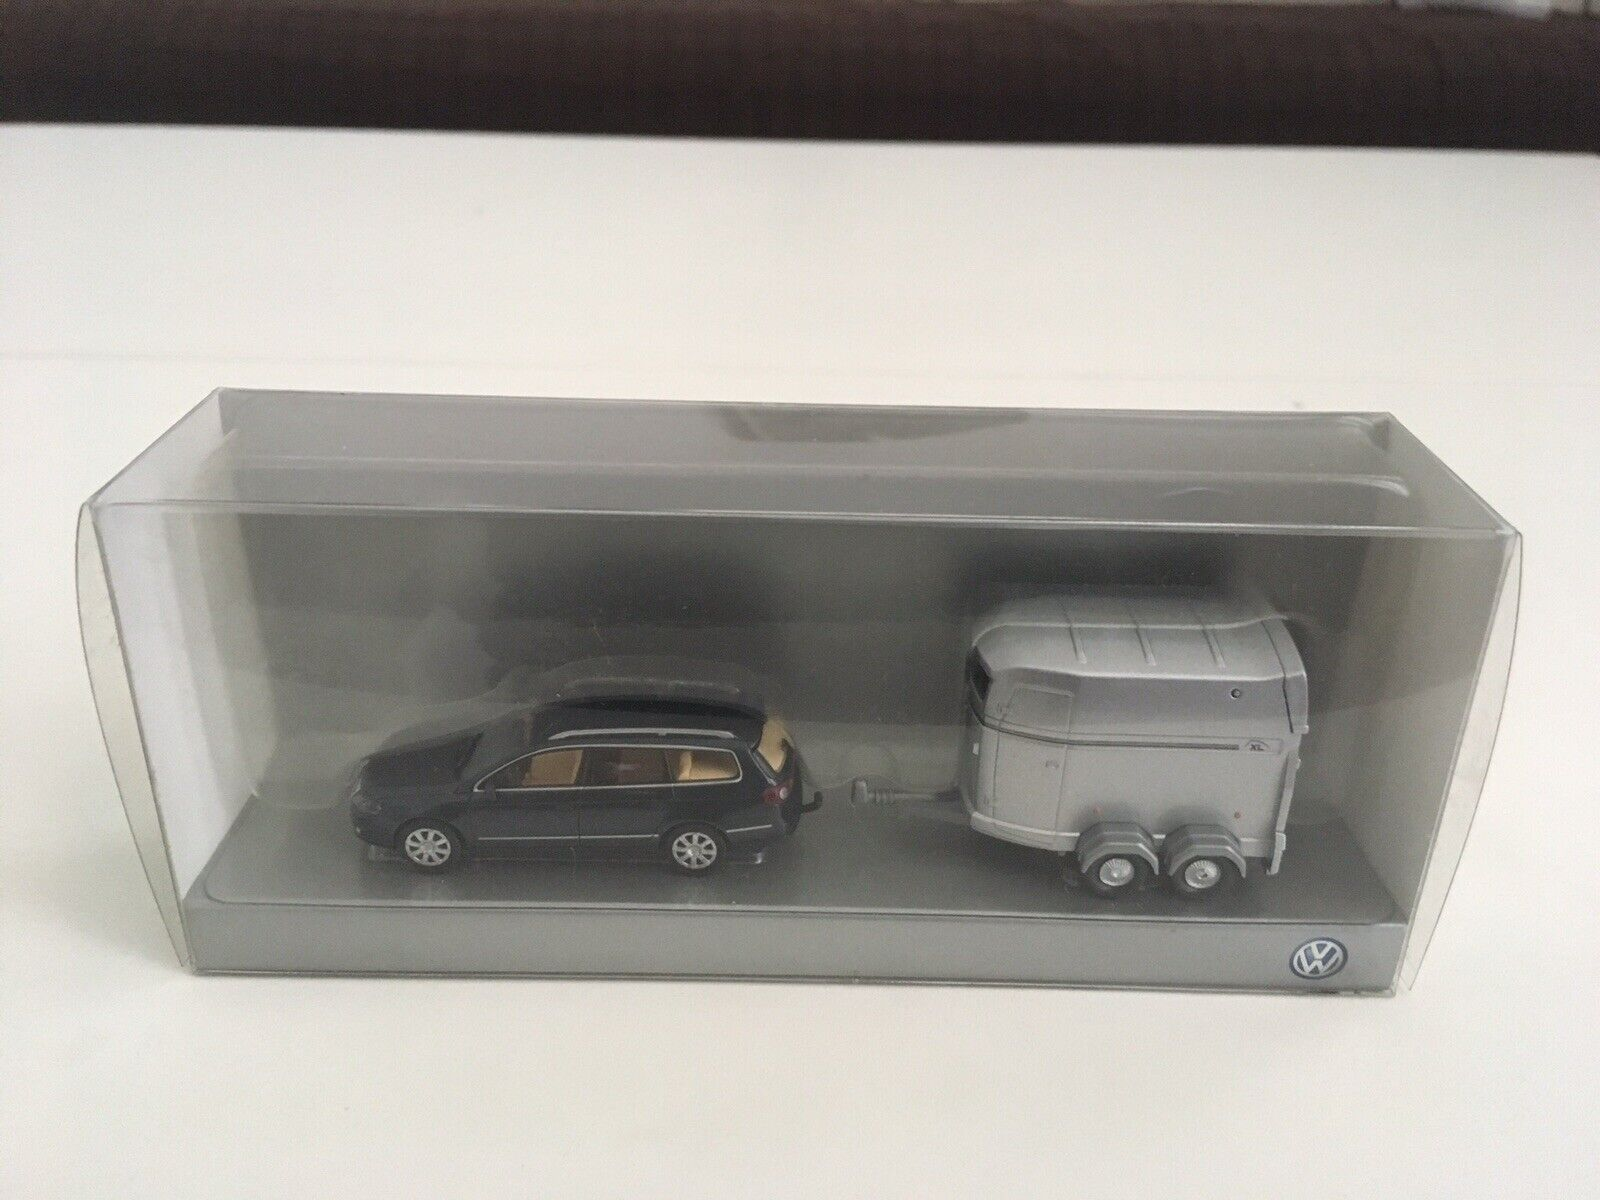 VW Passat Variant B6 + Horse Trailer - 1 87 scale - Viking